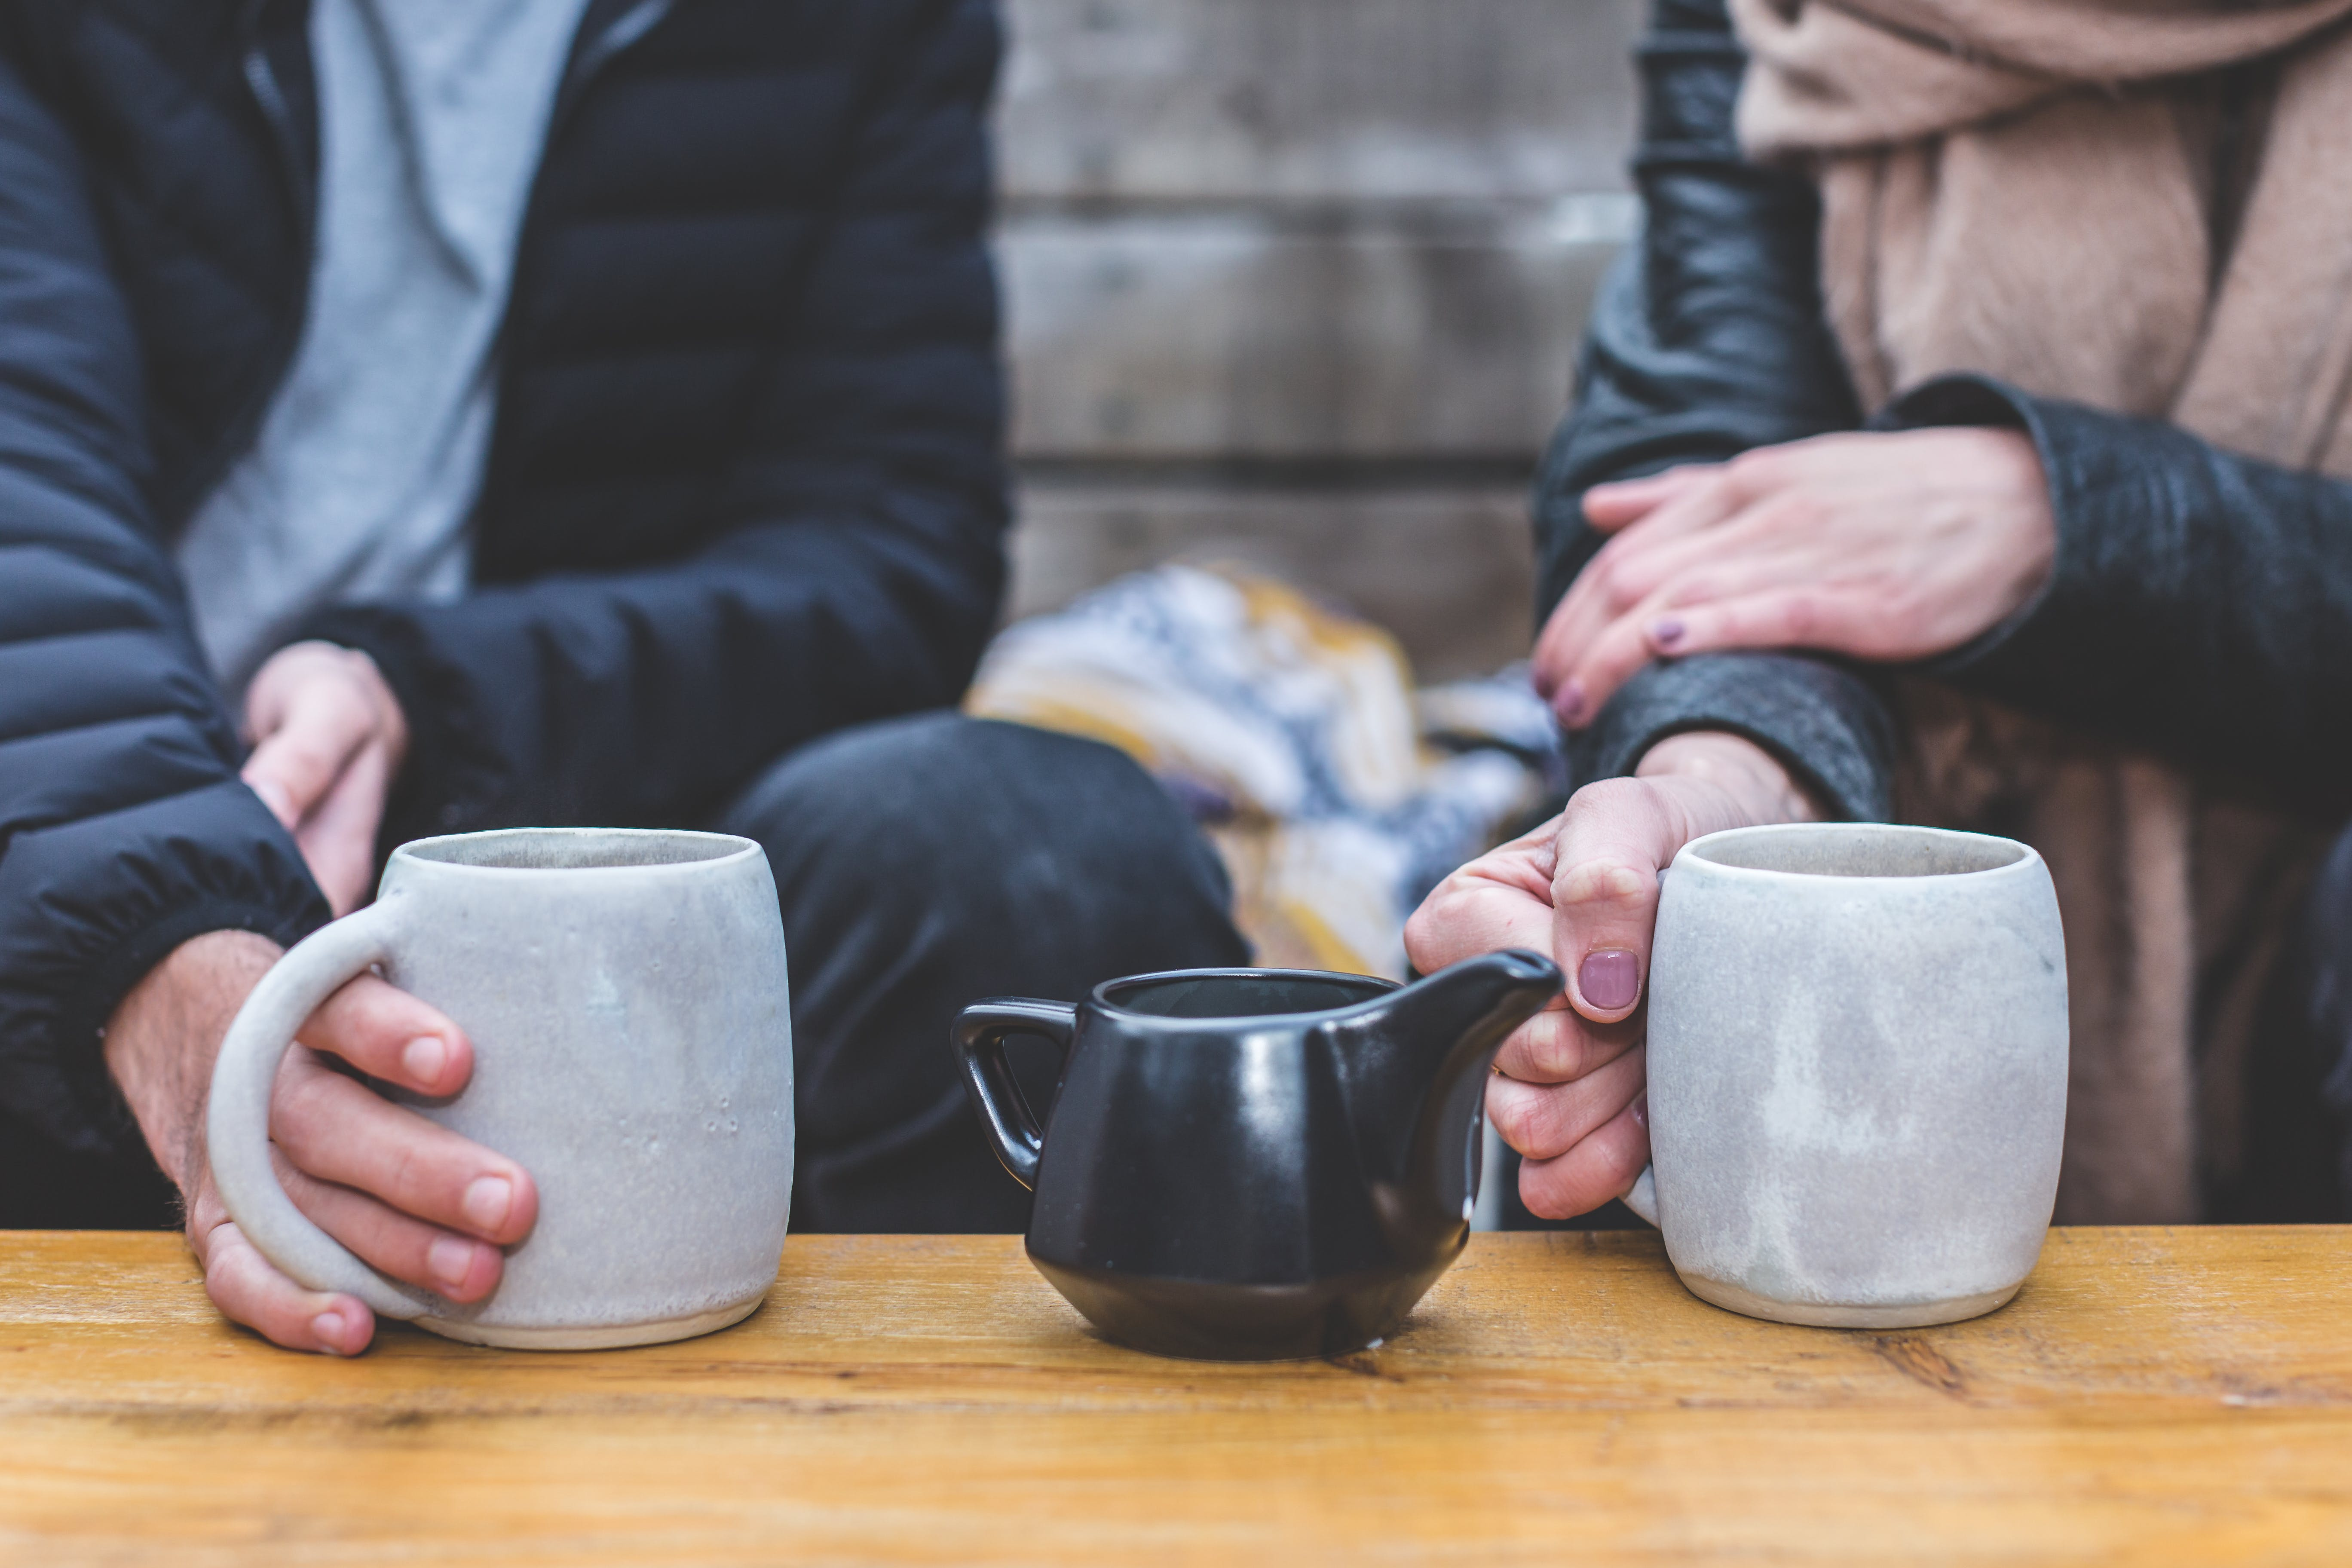 Man and Woman Having a Tea Conversation